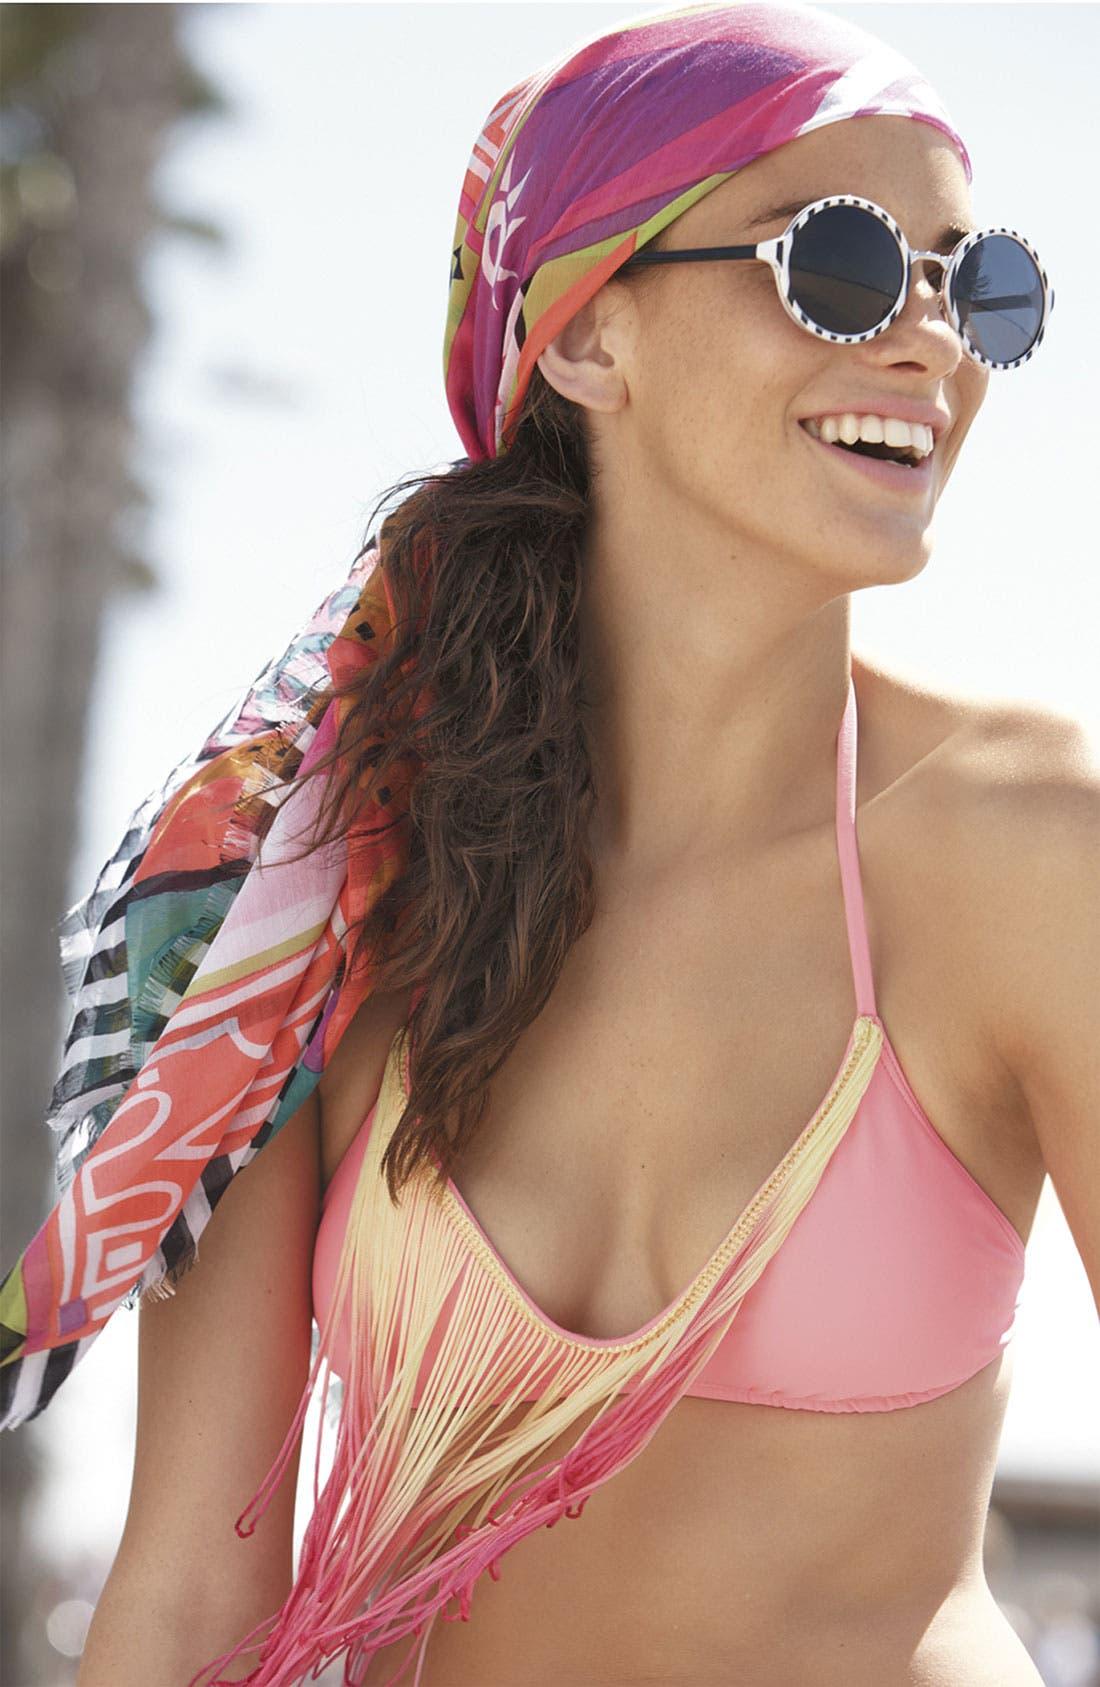 Main Image - The Bikini Lab Bikini Top & Bottoms